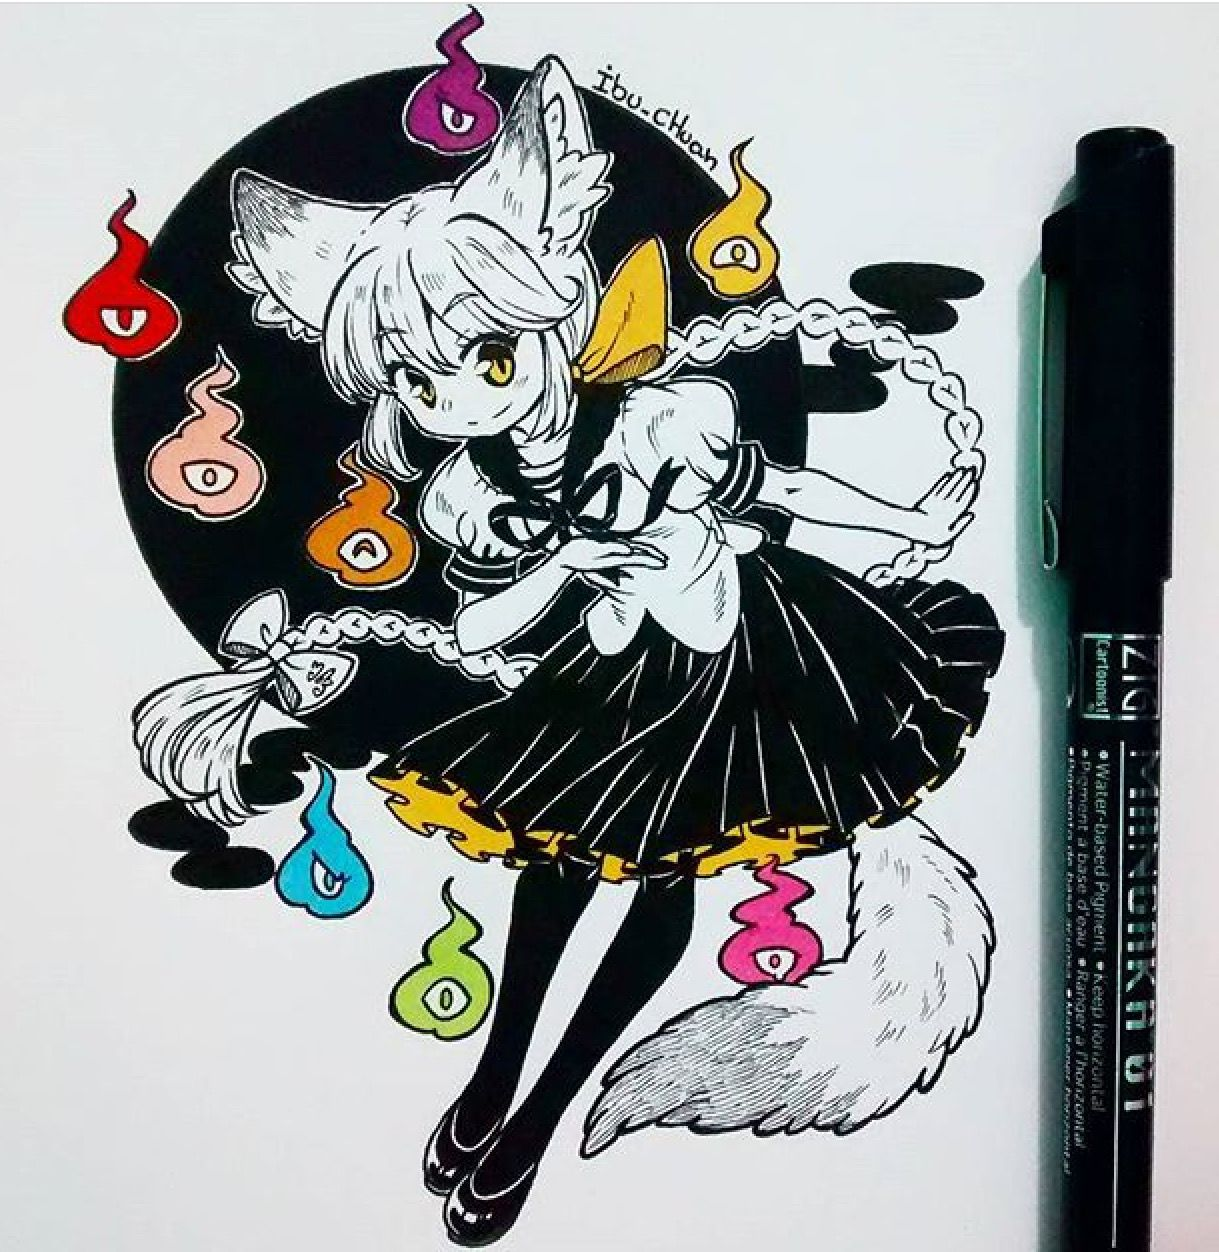 Nya~@ibu_chuan Instagram | Art | Pinterest | Instagram, Anime and Chibi